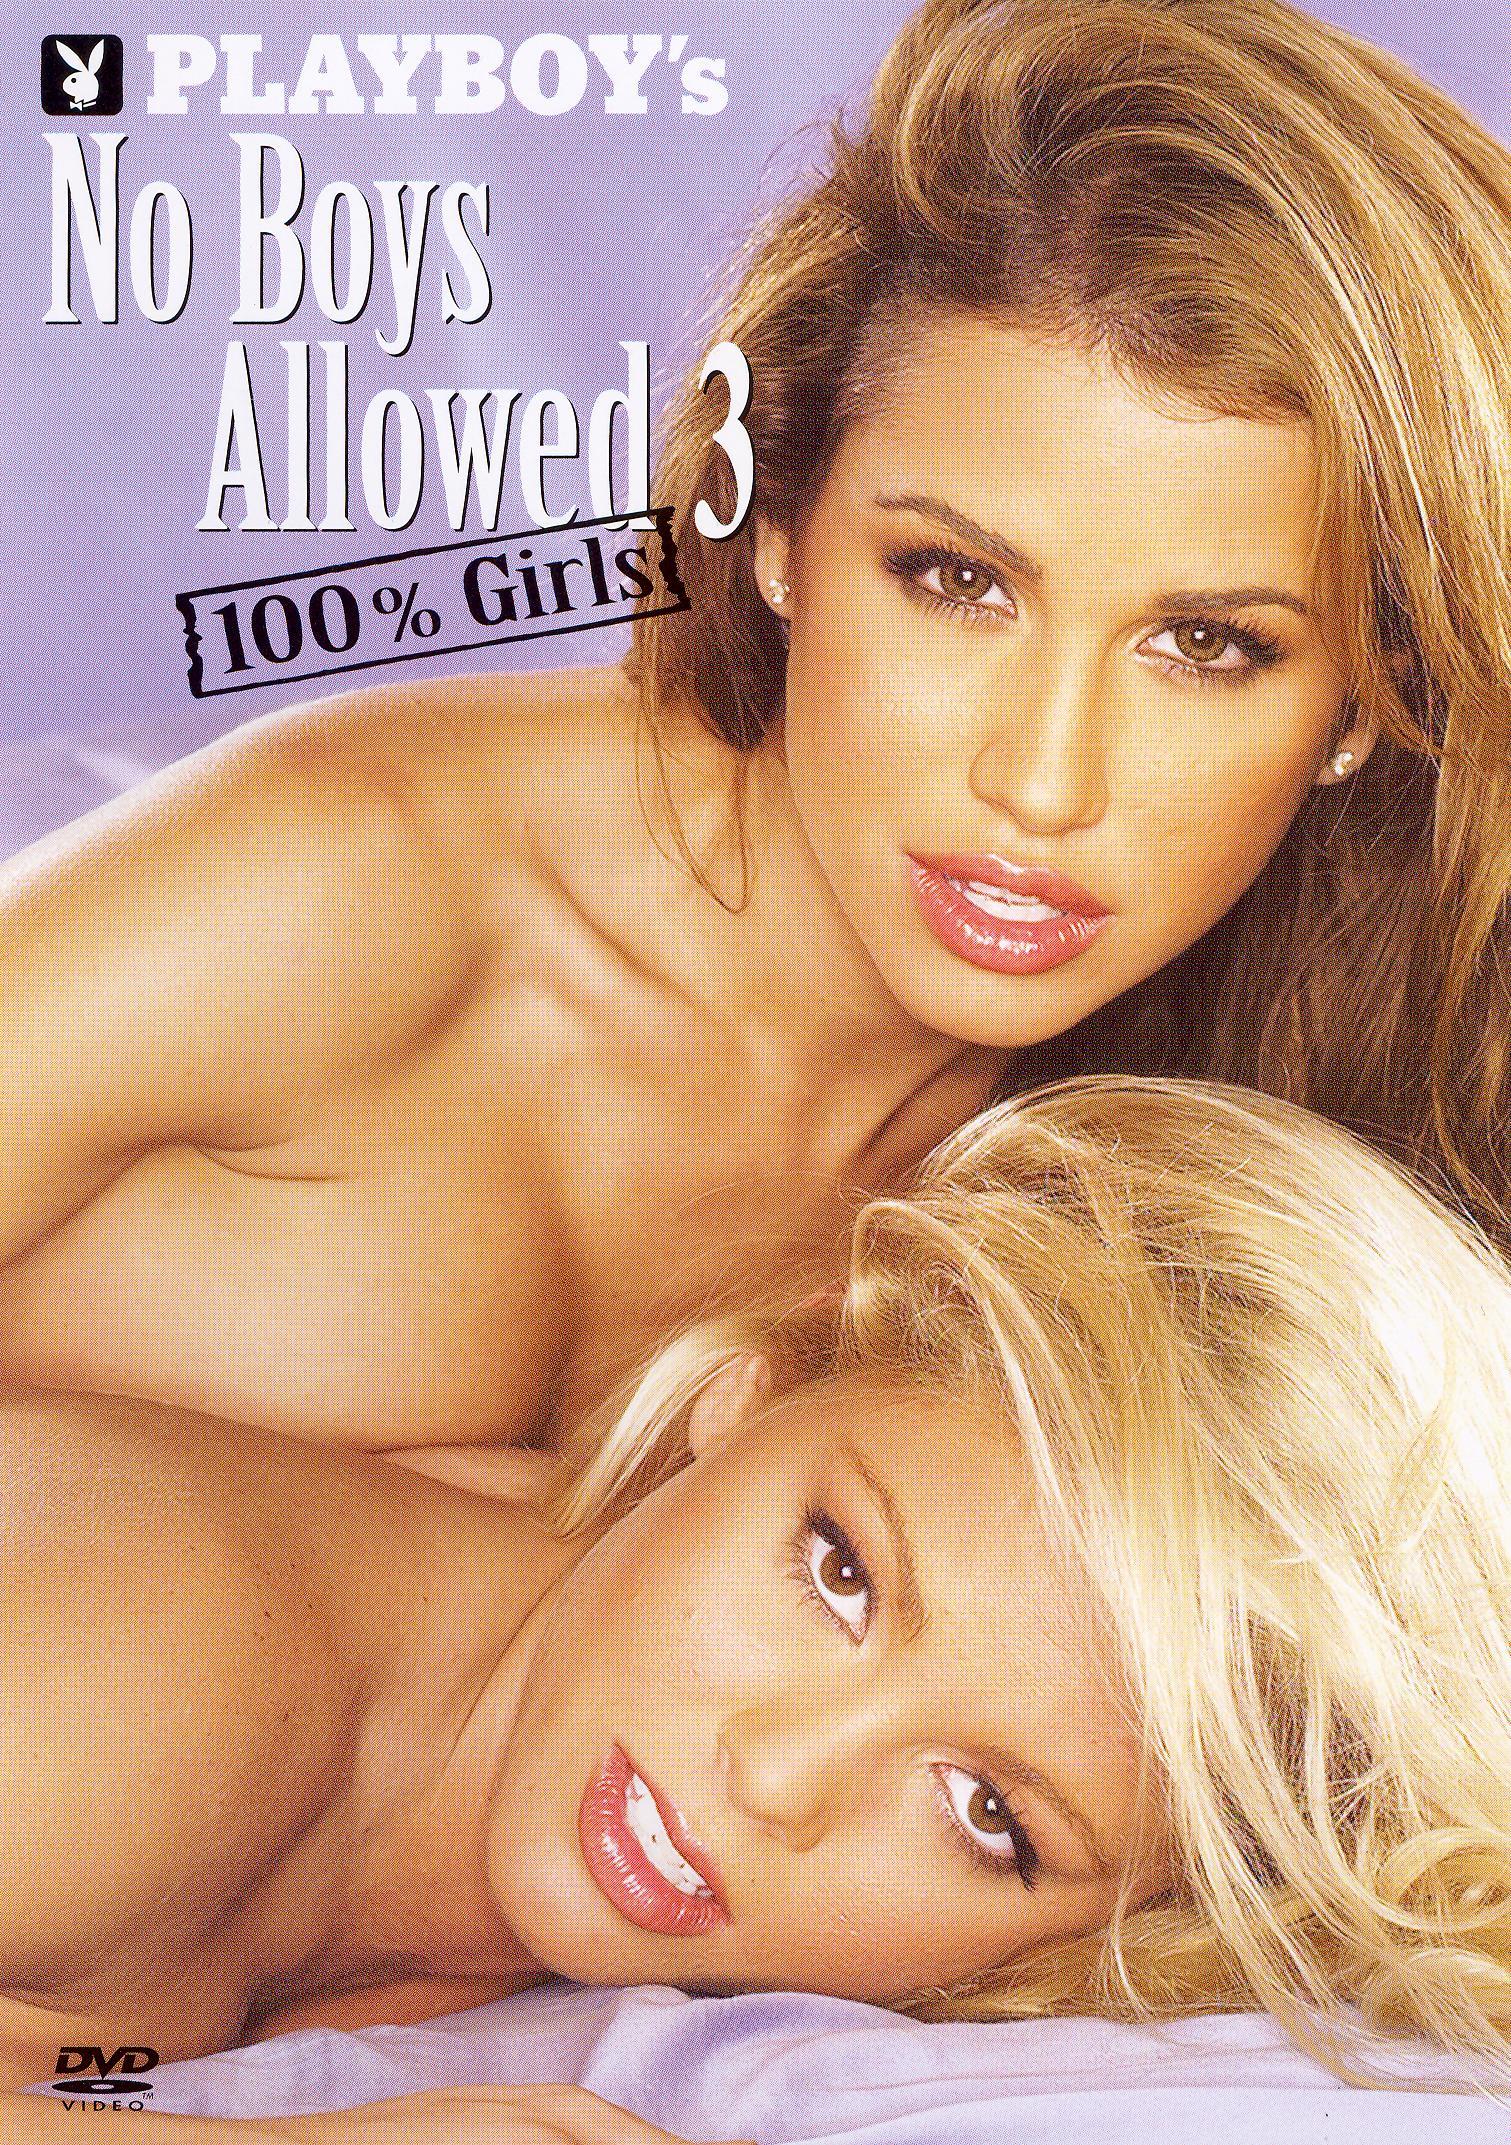 Playboy: No Boys Allowed 3